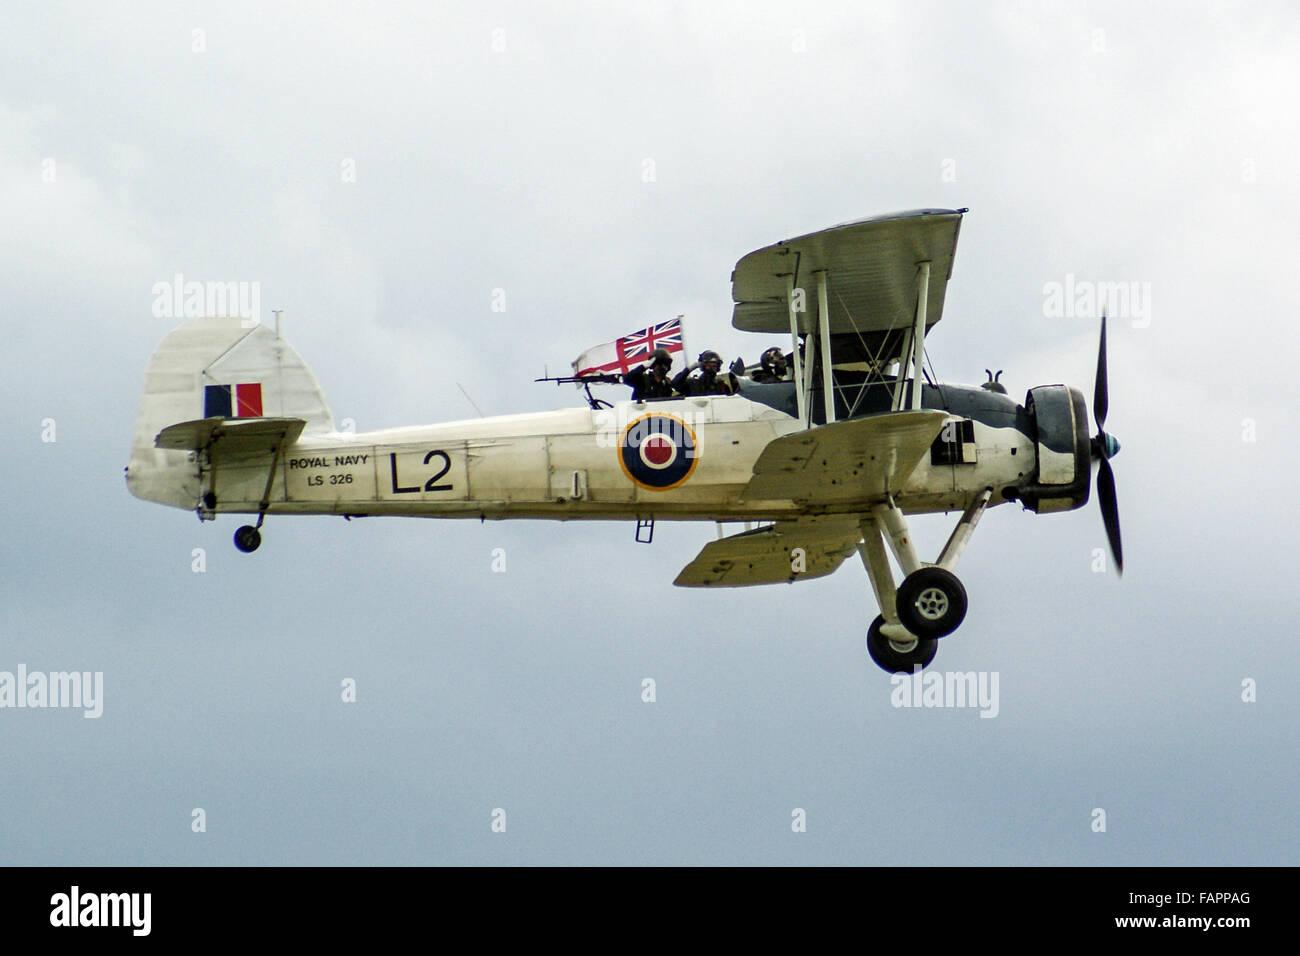 Fairey Swordfish in flight - Stock Image